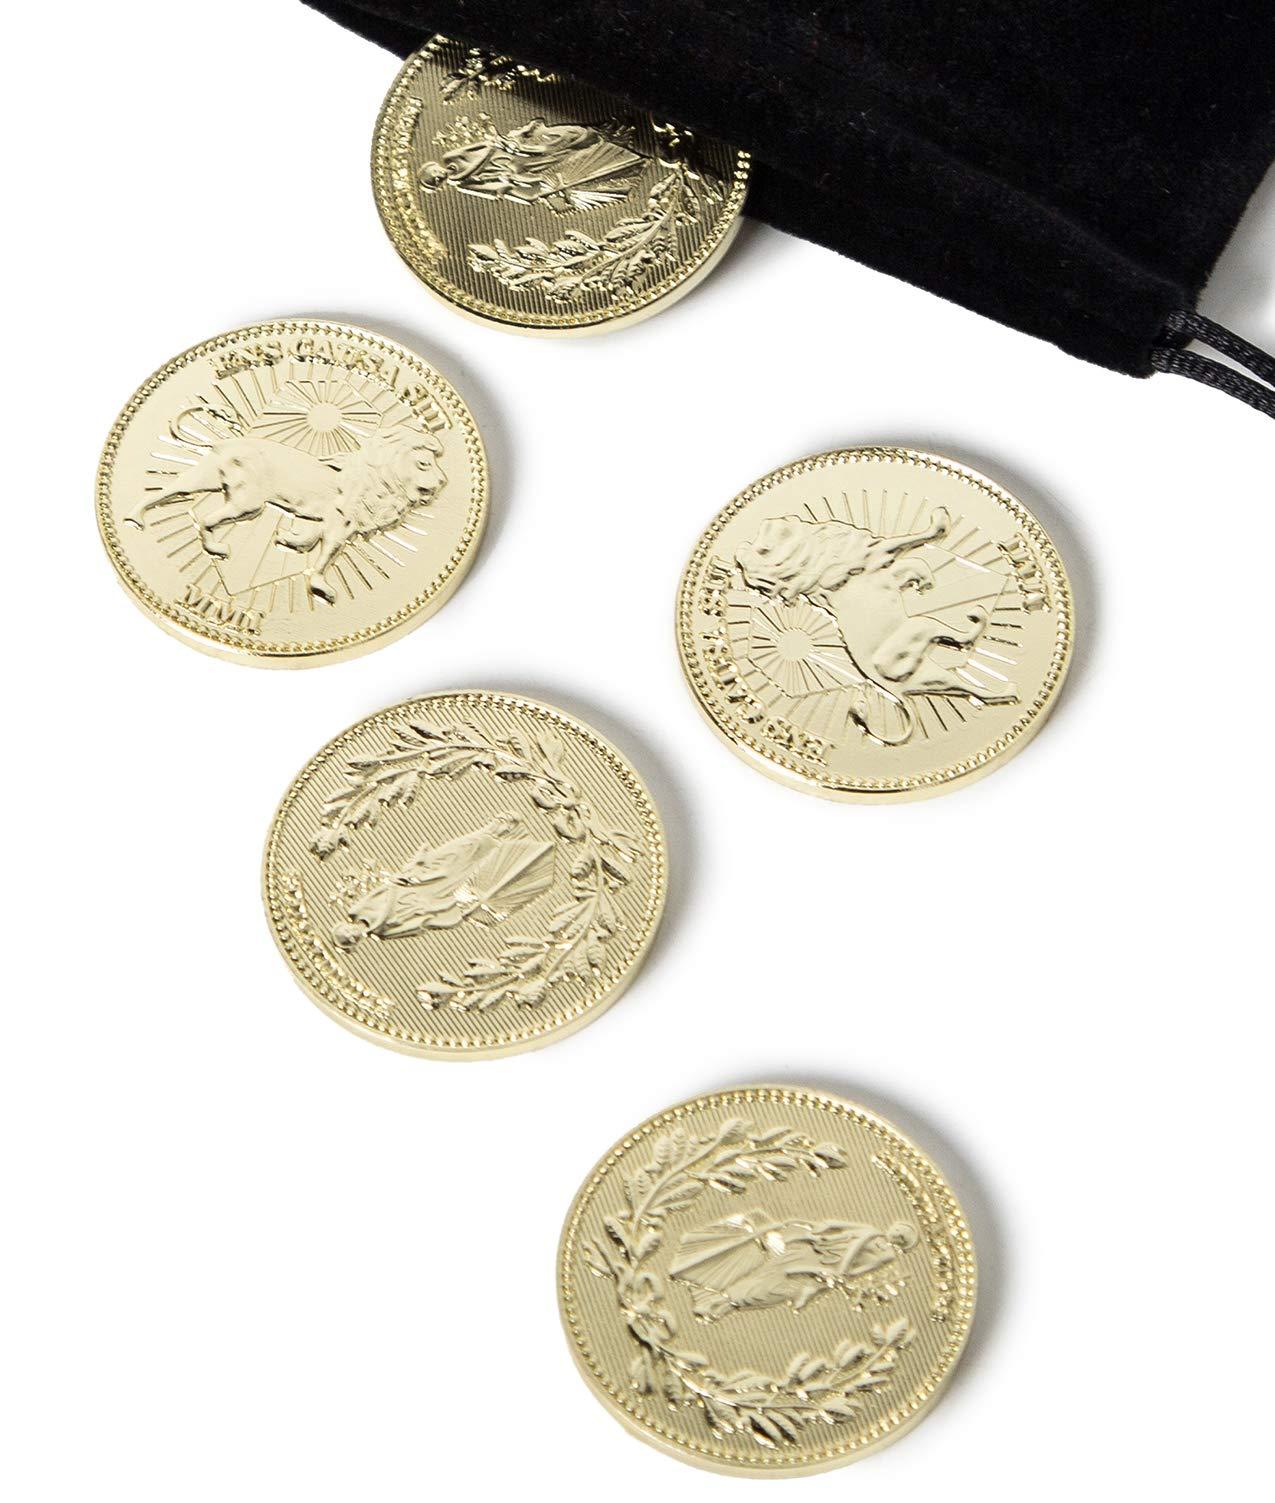 John Wick Coin,John Wick Collecting Coins Golden Metal Coin 5 Pcs